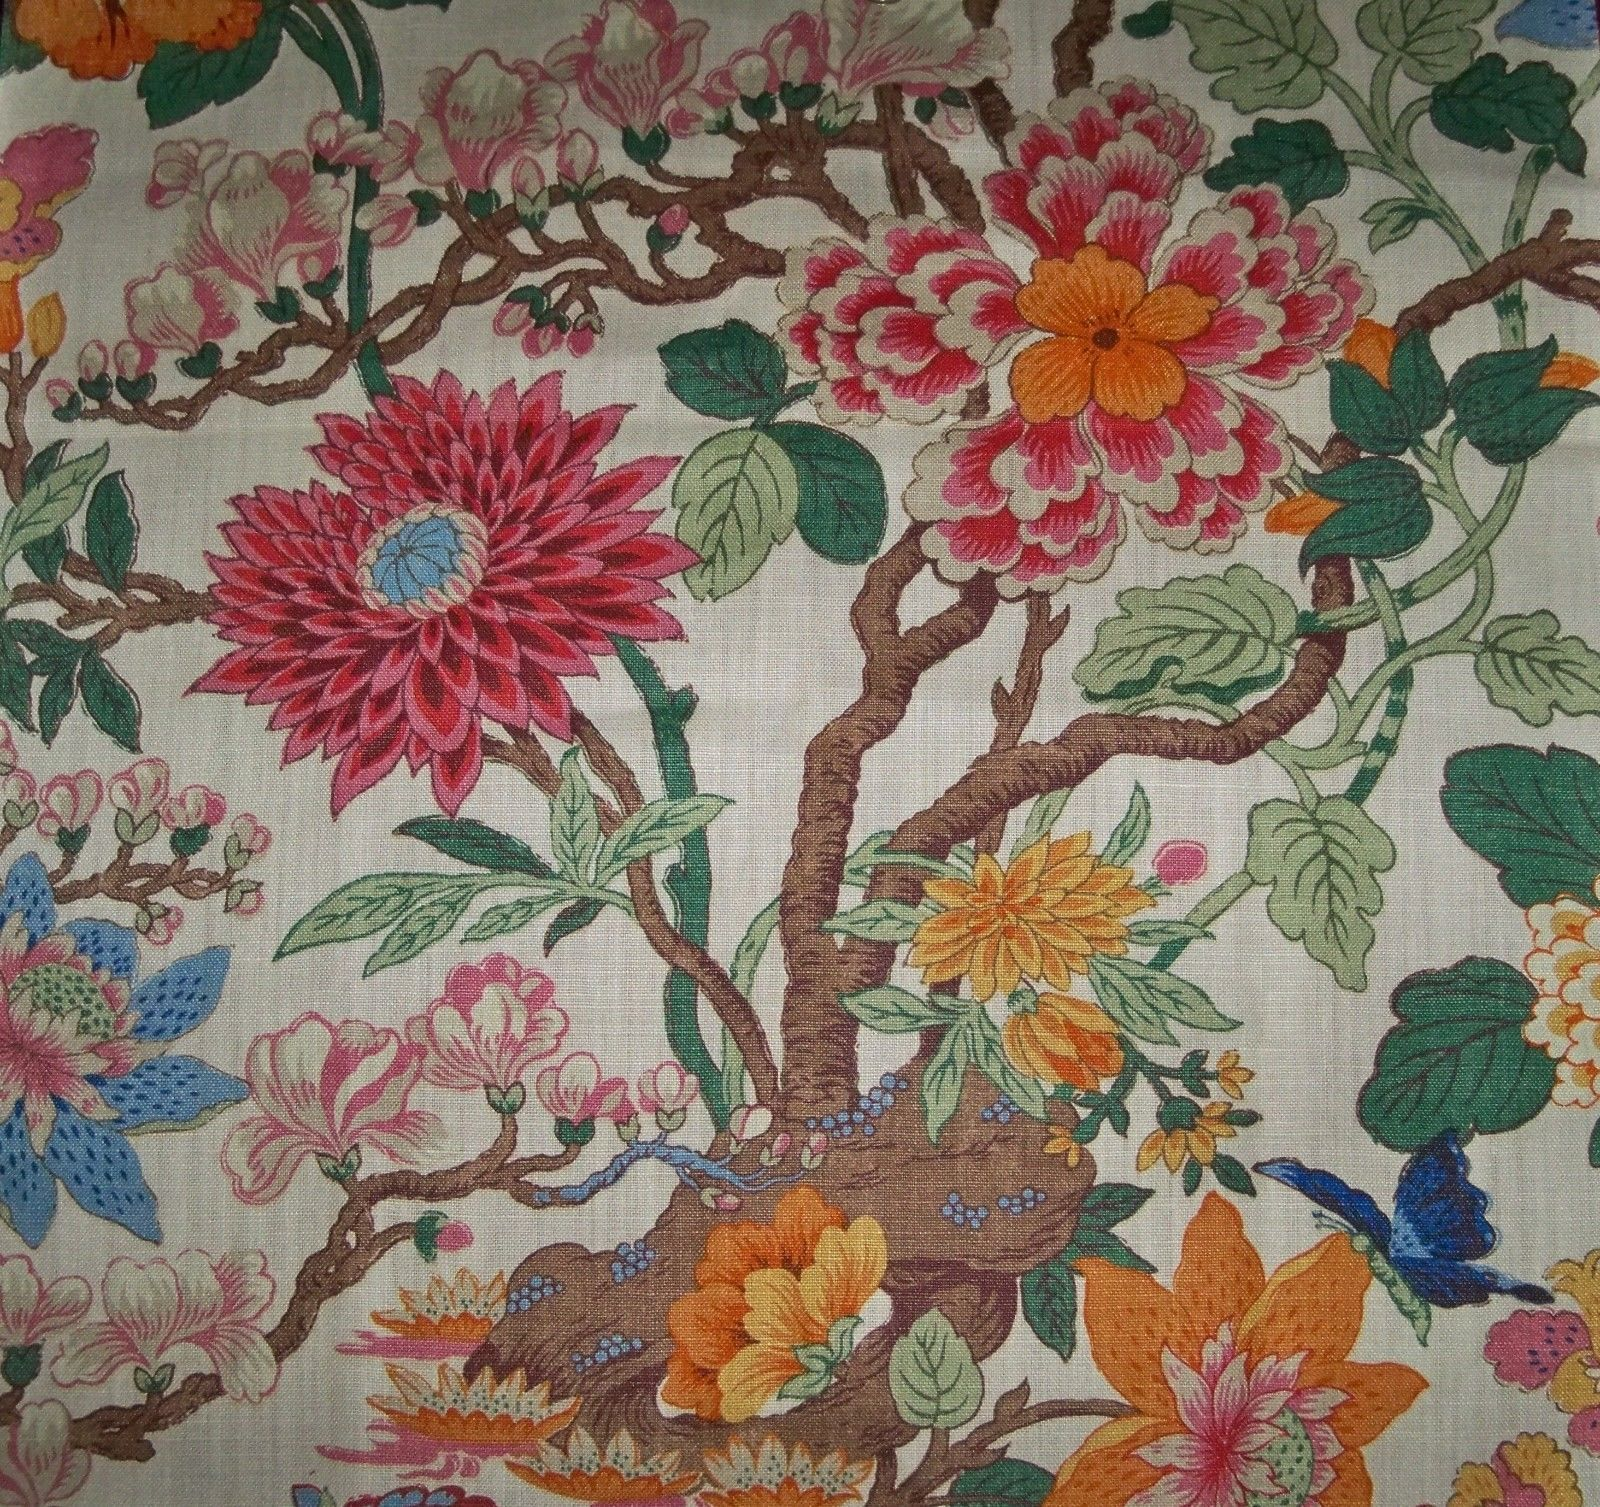 Details About Lee Jofa Kravet William Morris Inspired Art